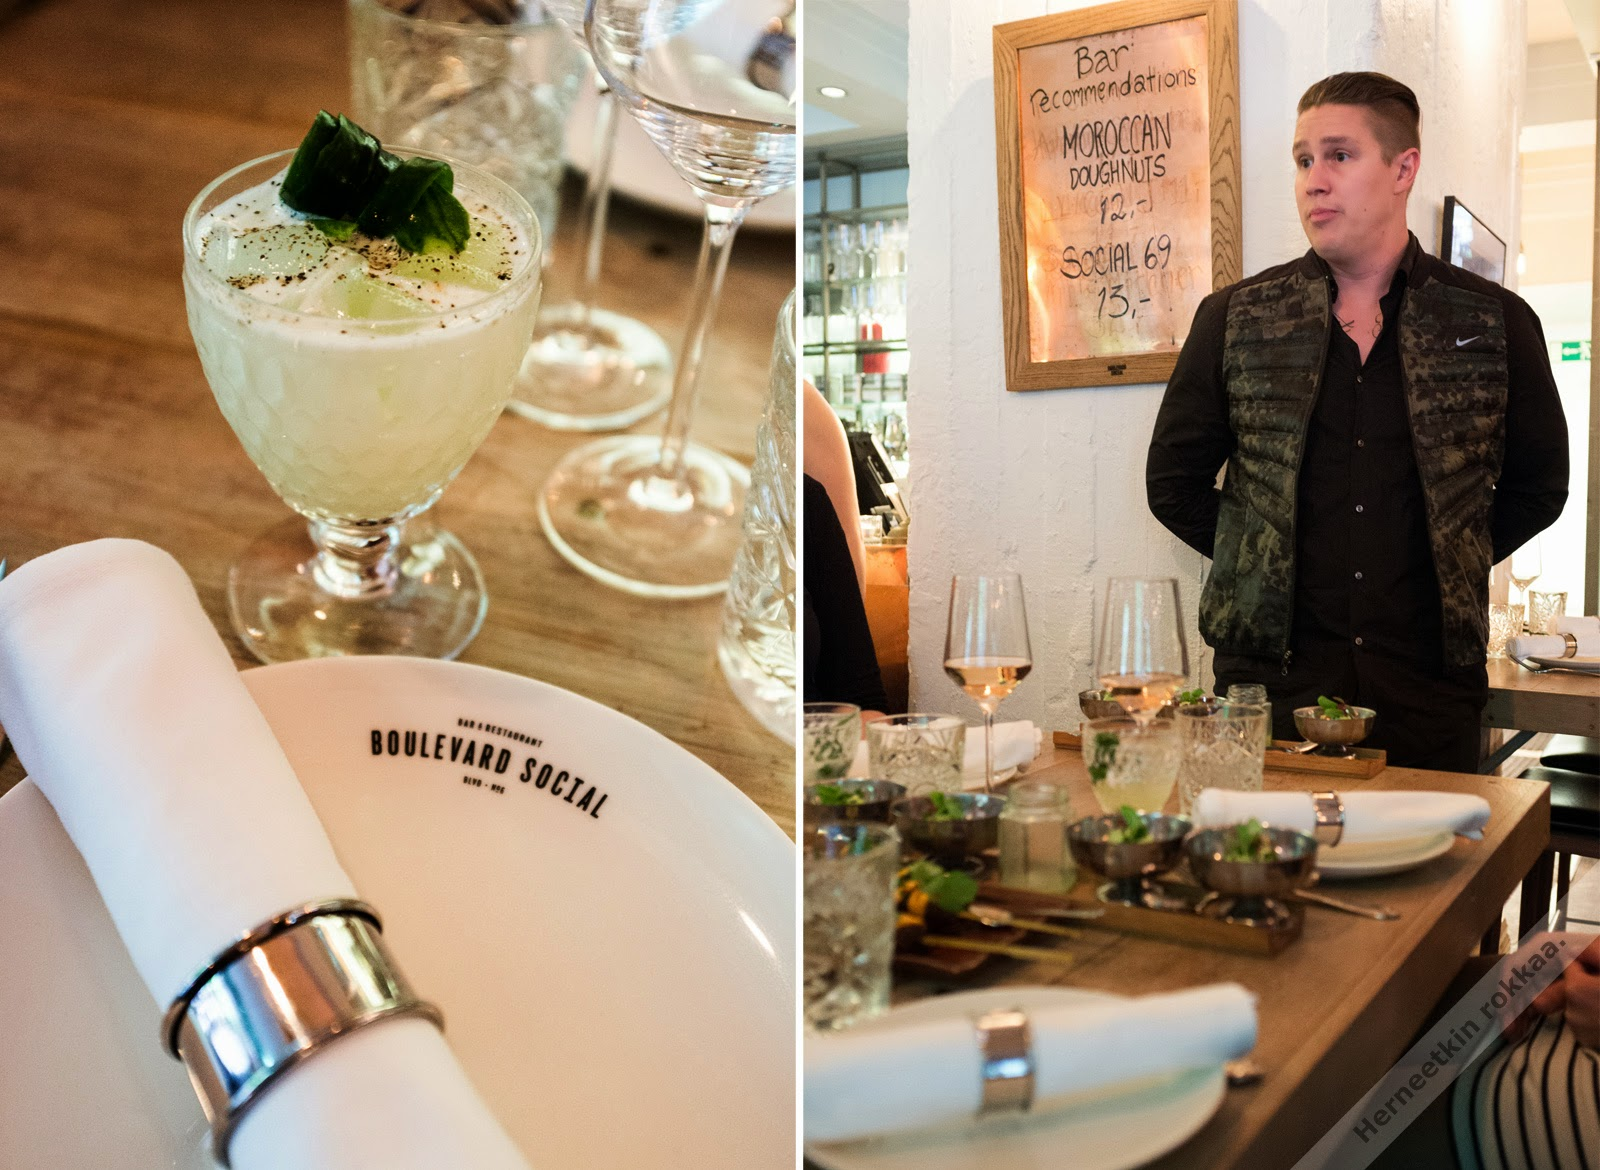 Maisteltu, Ravintola Gaijin ja Boulevard Social